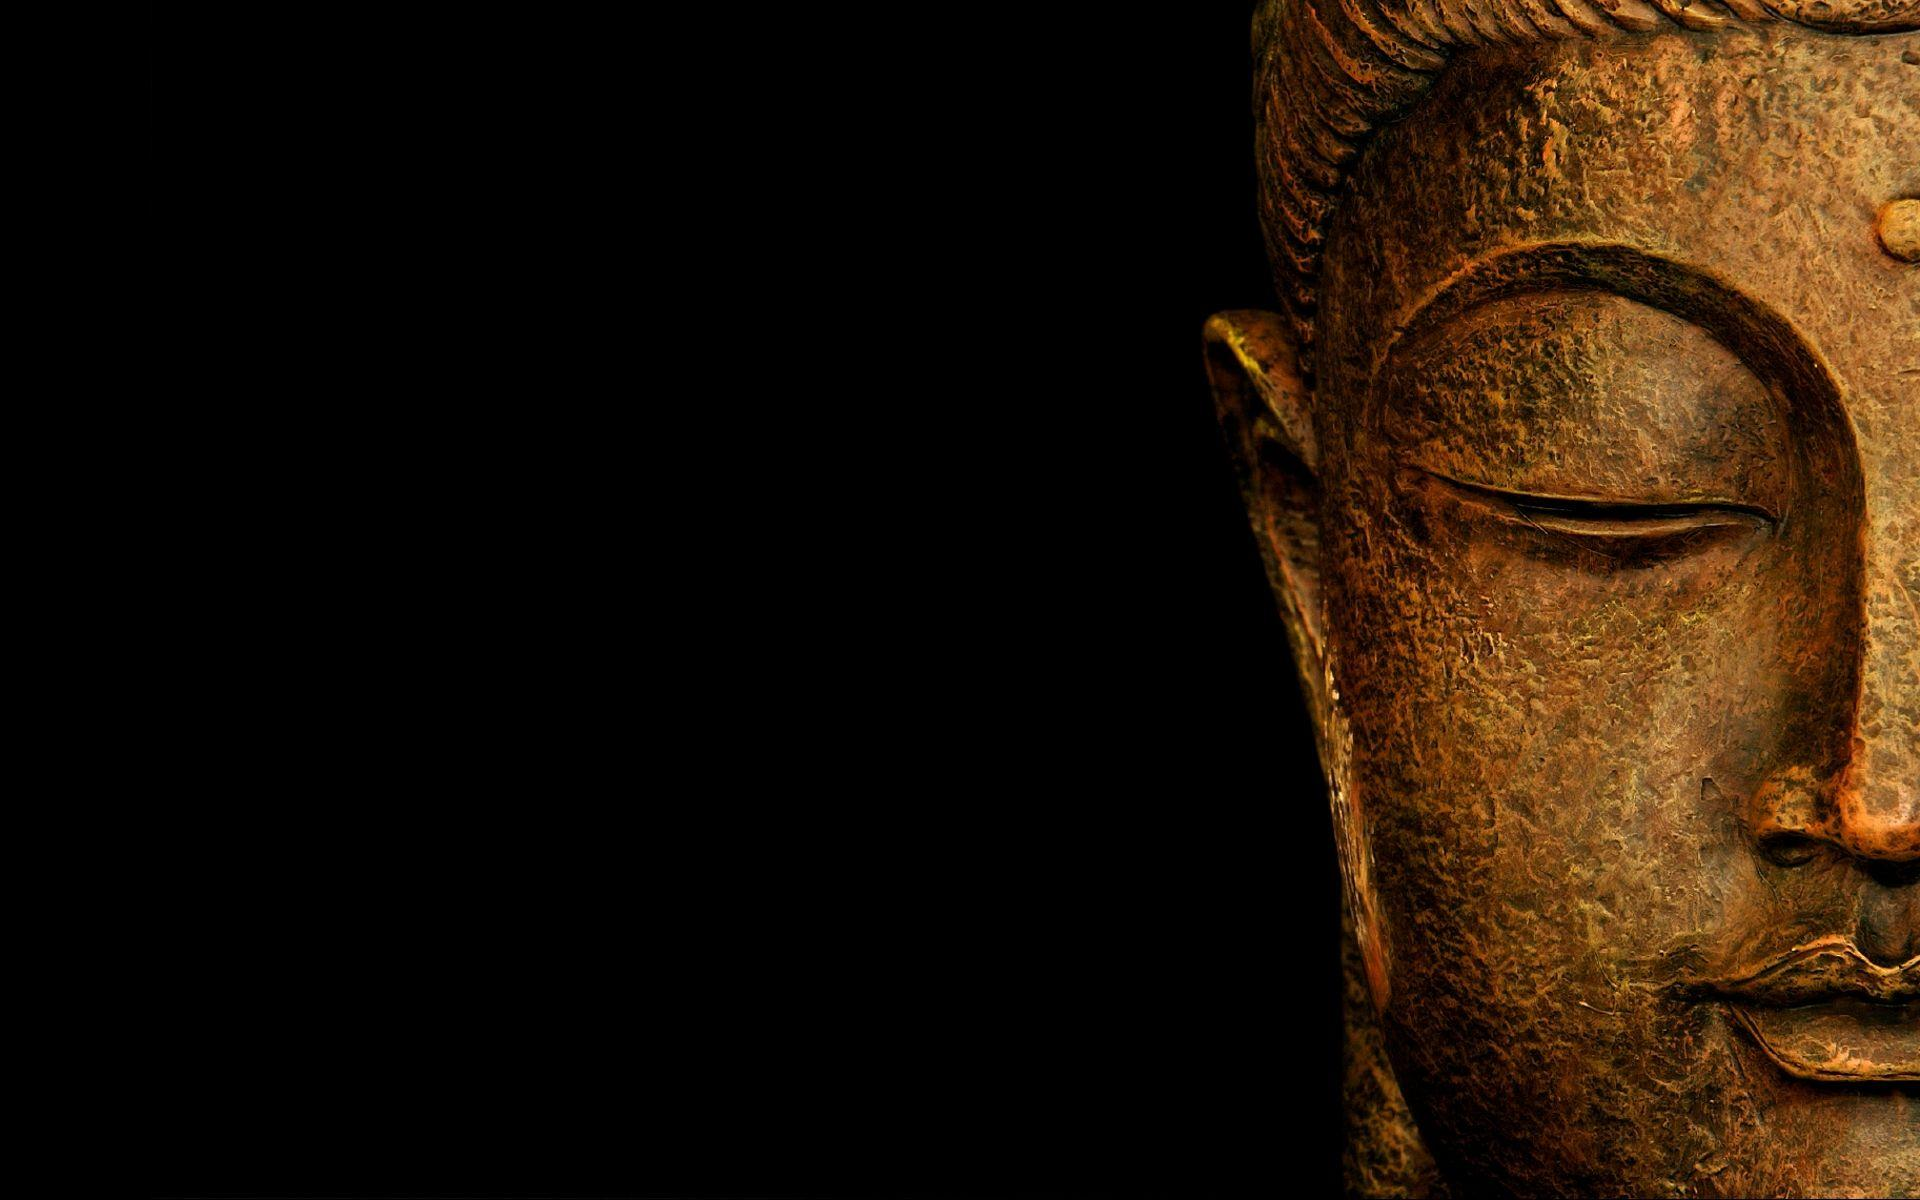 Gautam Buddha Full Hd Wallpapers: Buddha HD Wallpapers